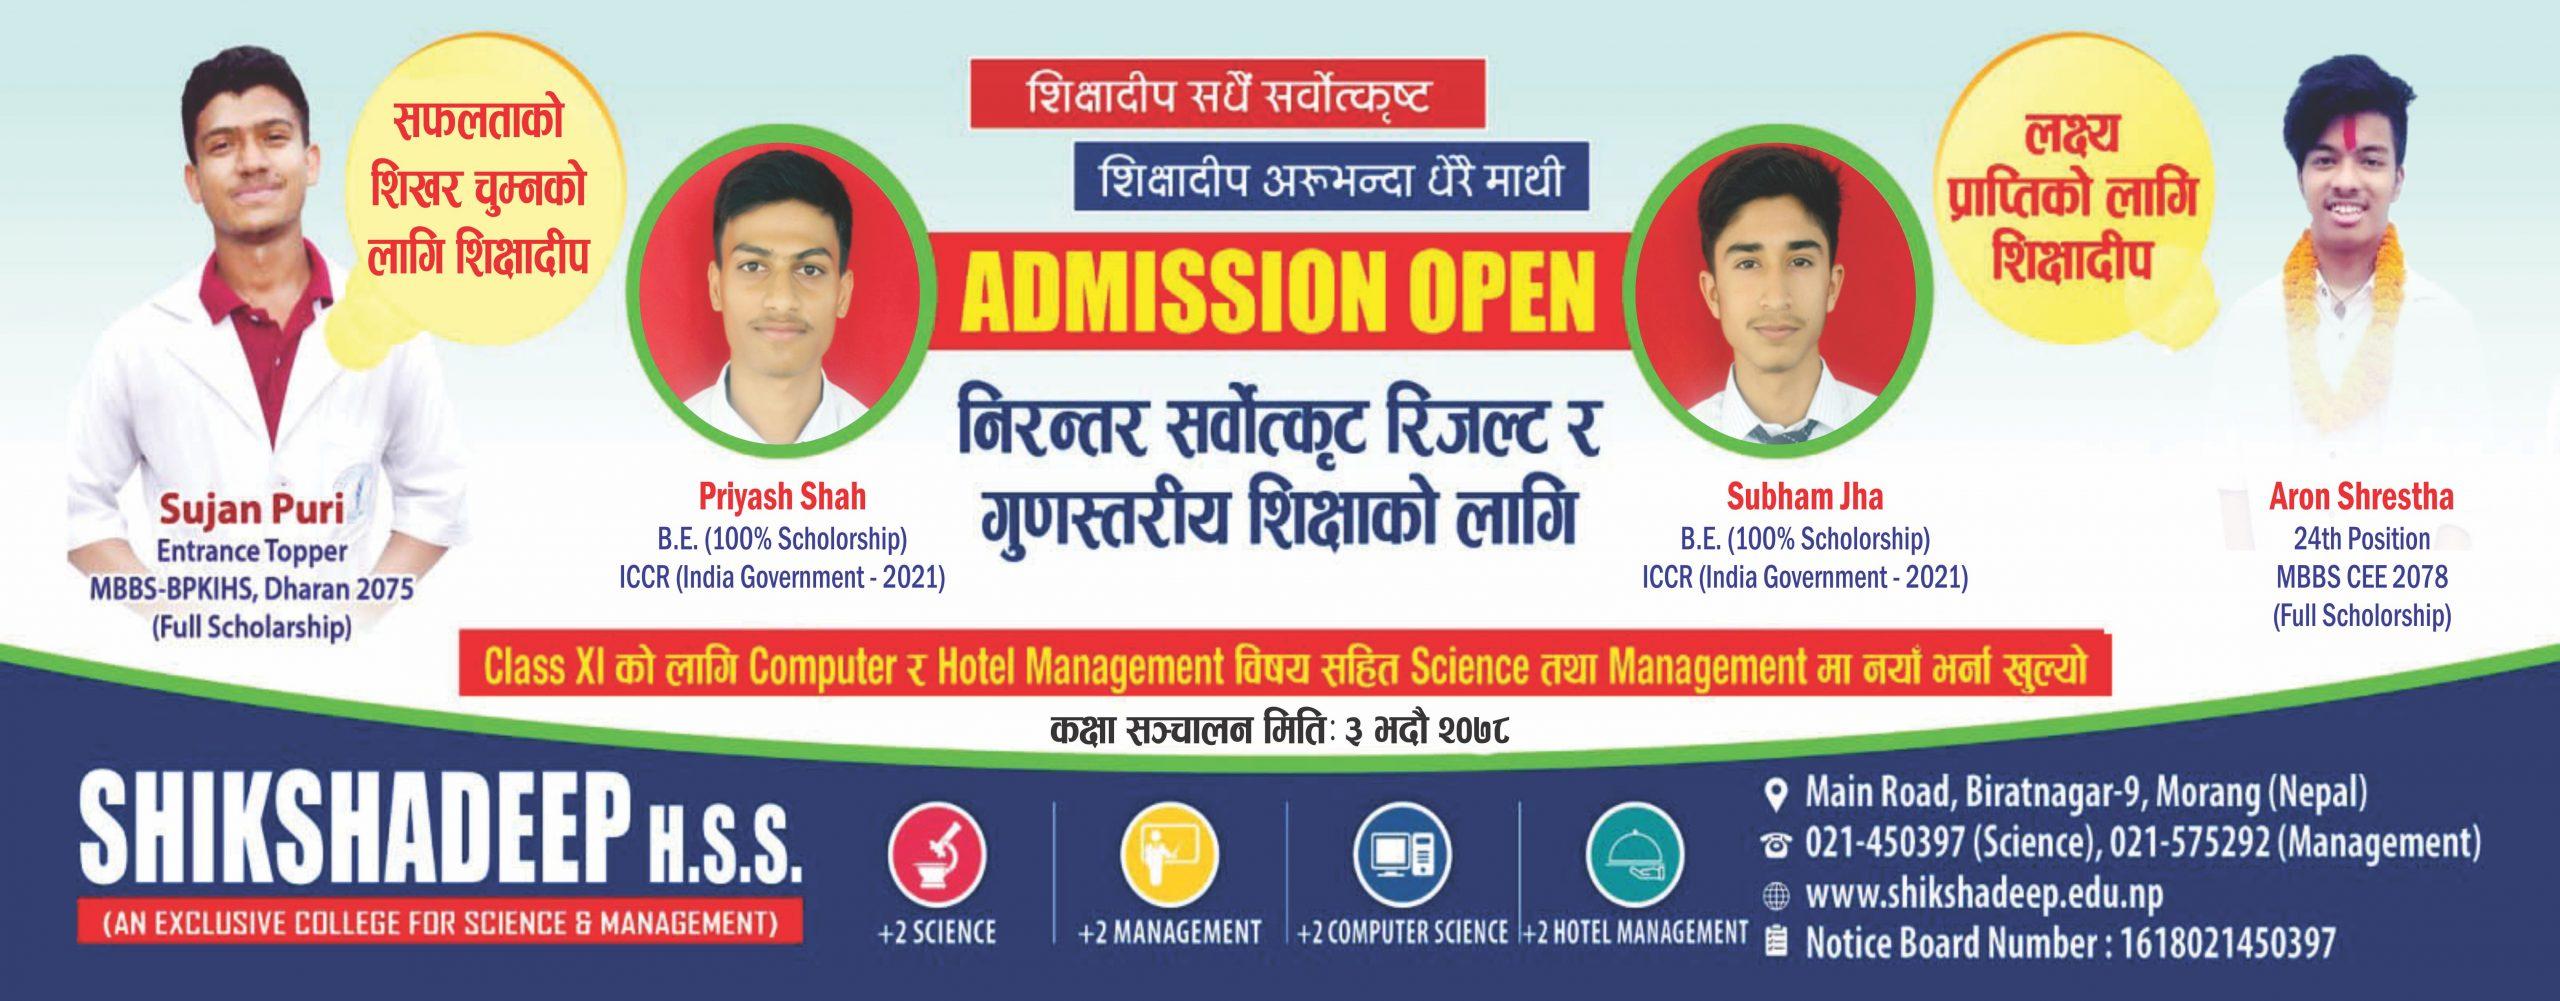 SHikhadeep college